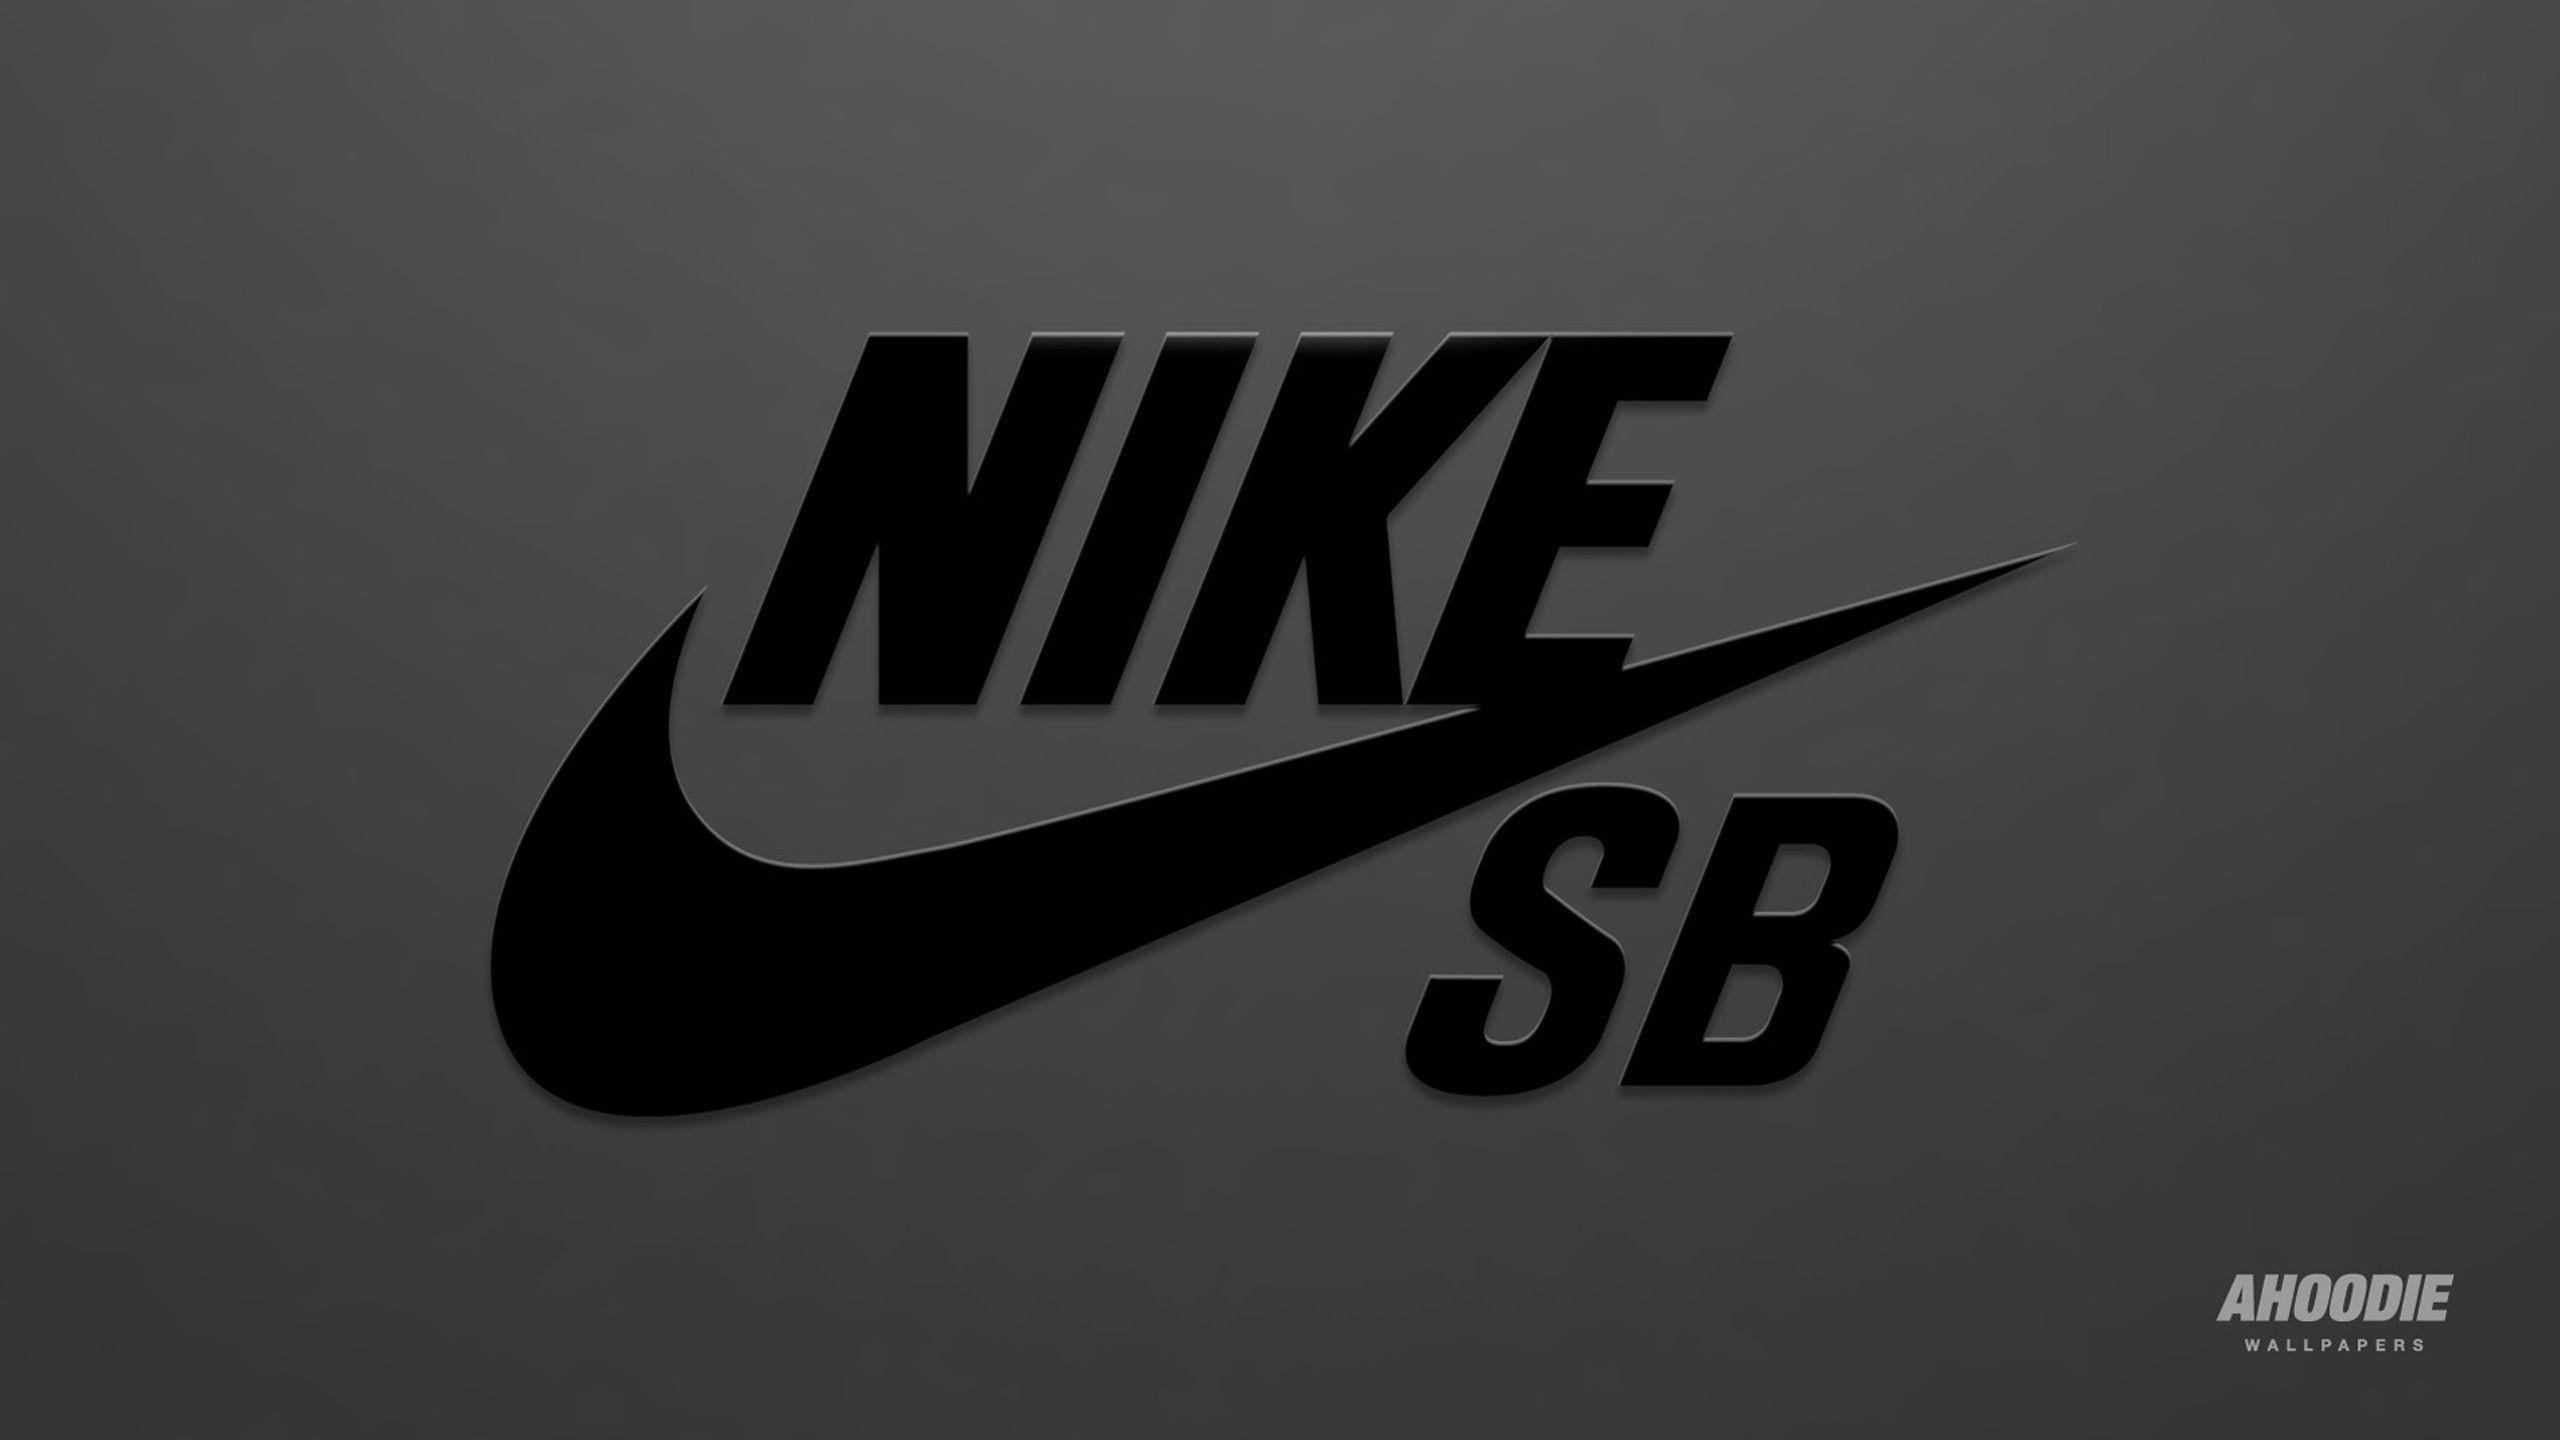 70 Black Nike Wallpapers On Wallpaperplay Nike Wallpaper Black Nike Wallpaper Cool Nike Wallpapers